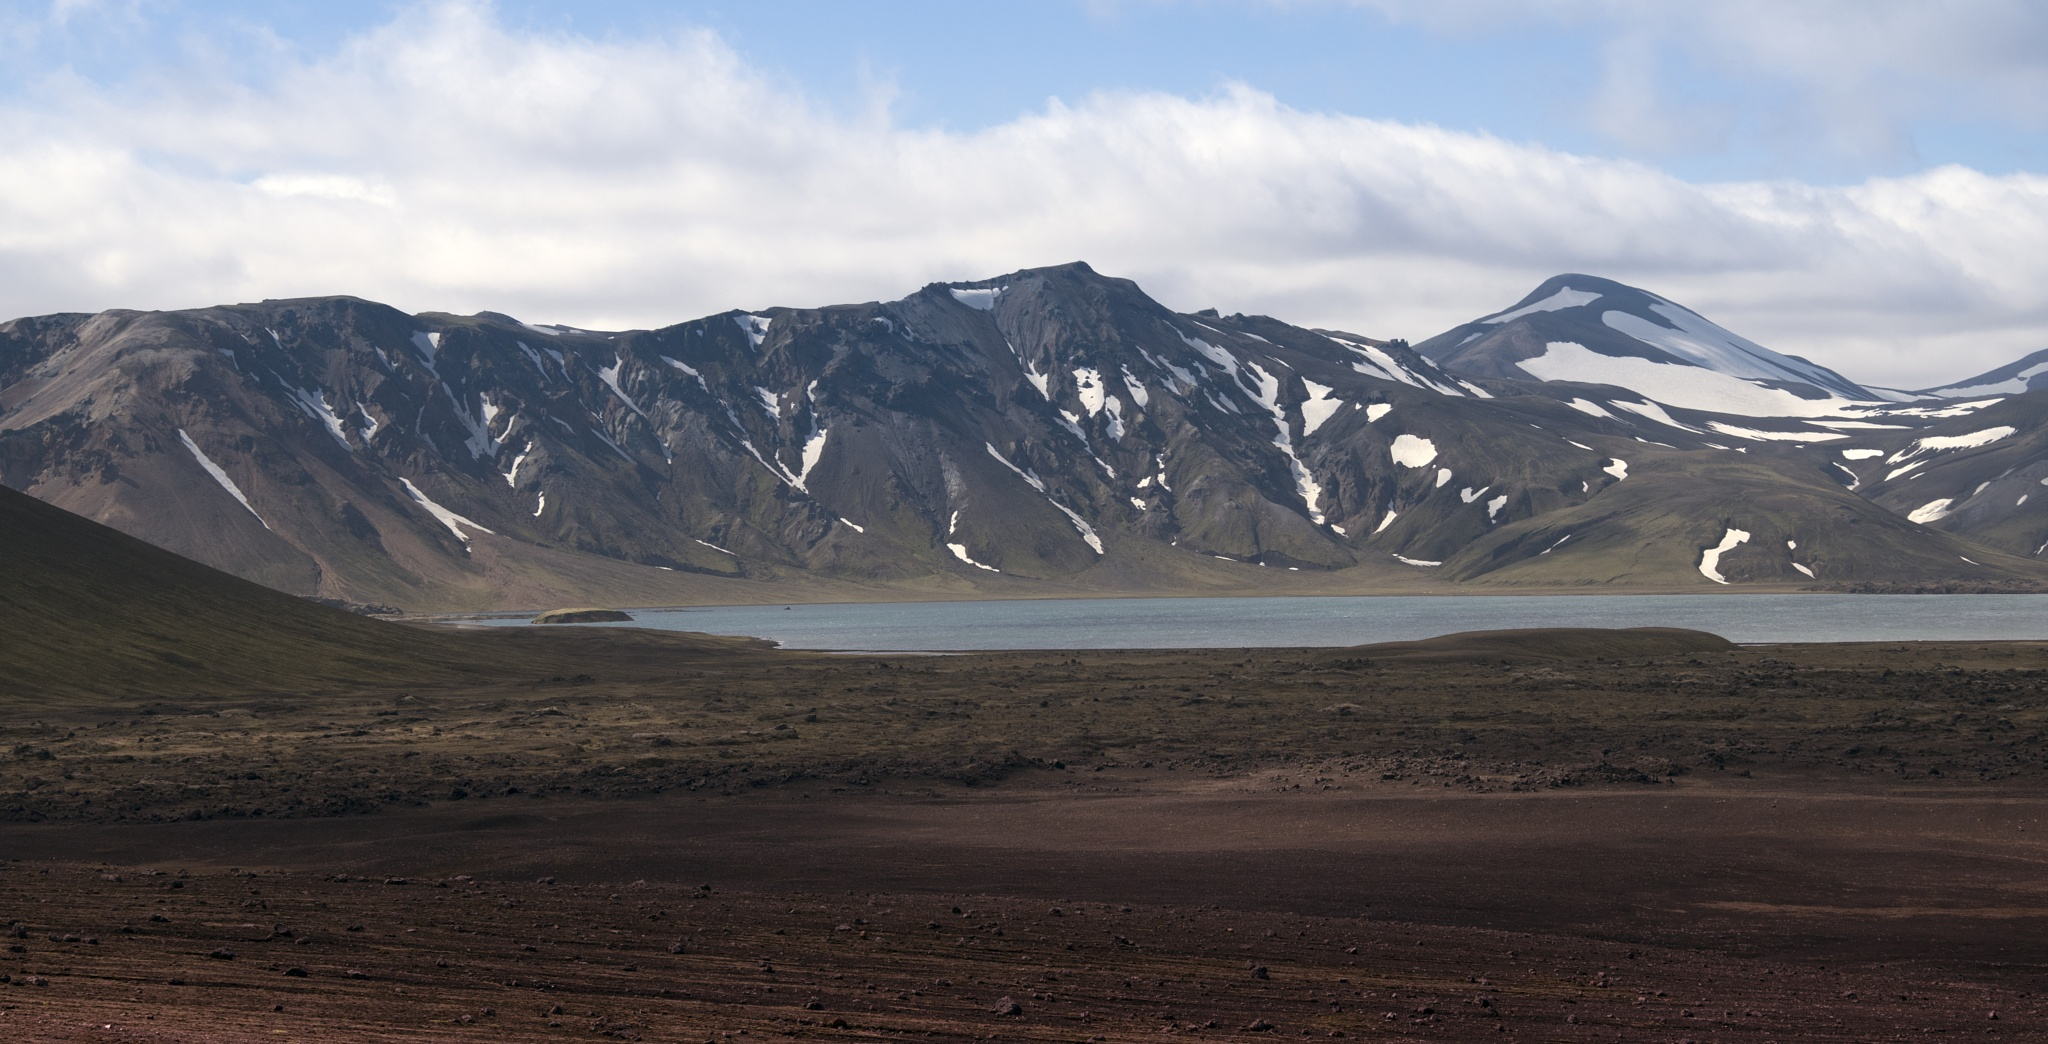 Landmannalaugar mountains by MarieJirousek